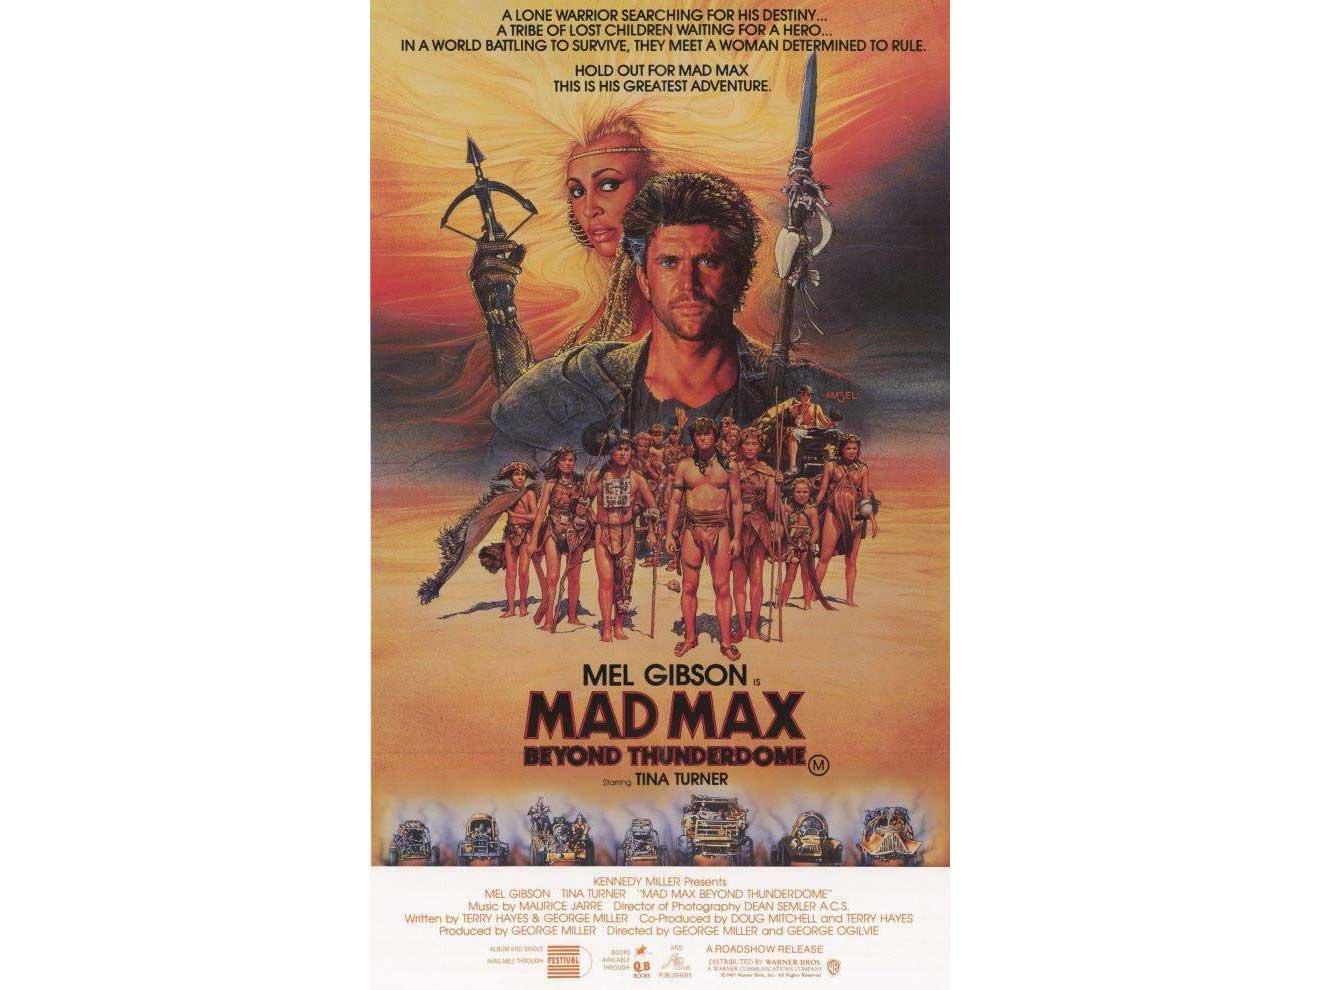 mad max movie cover